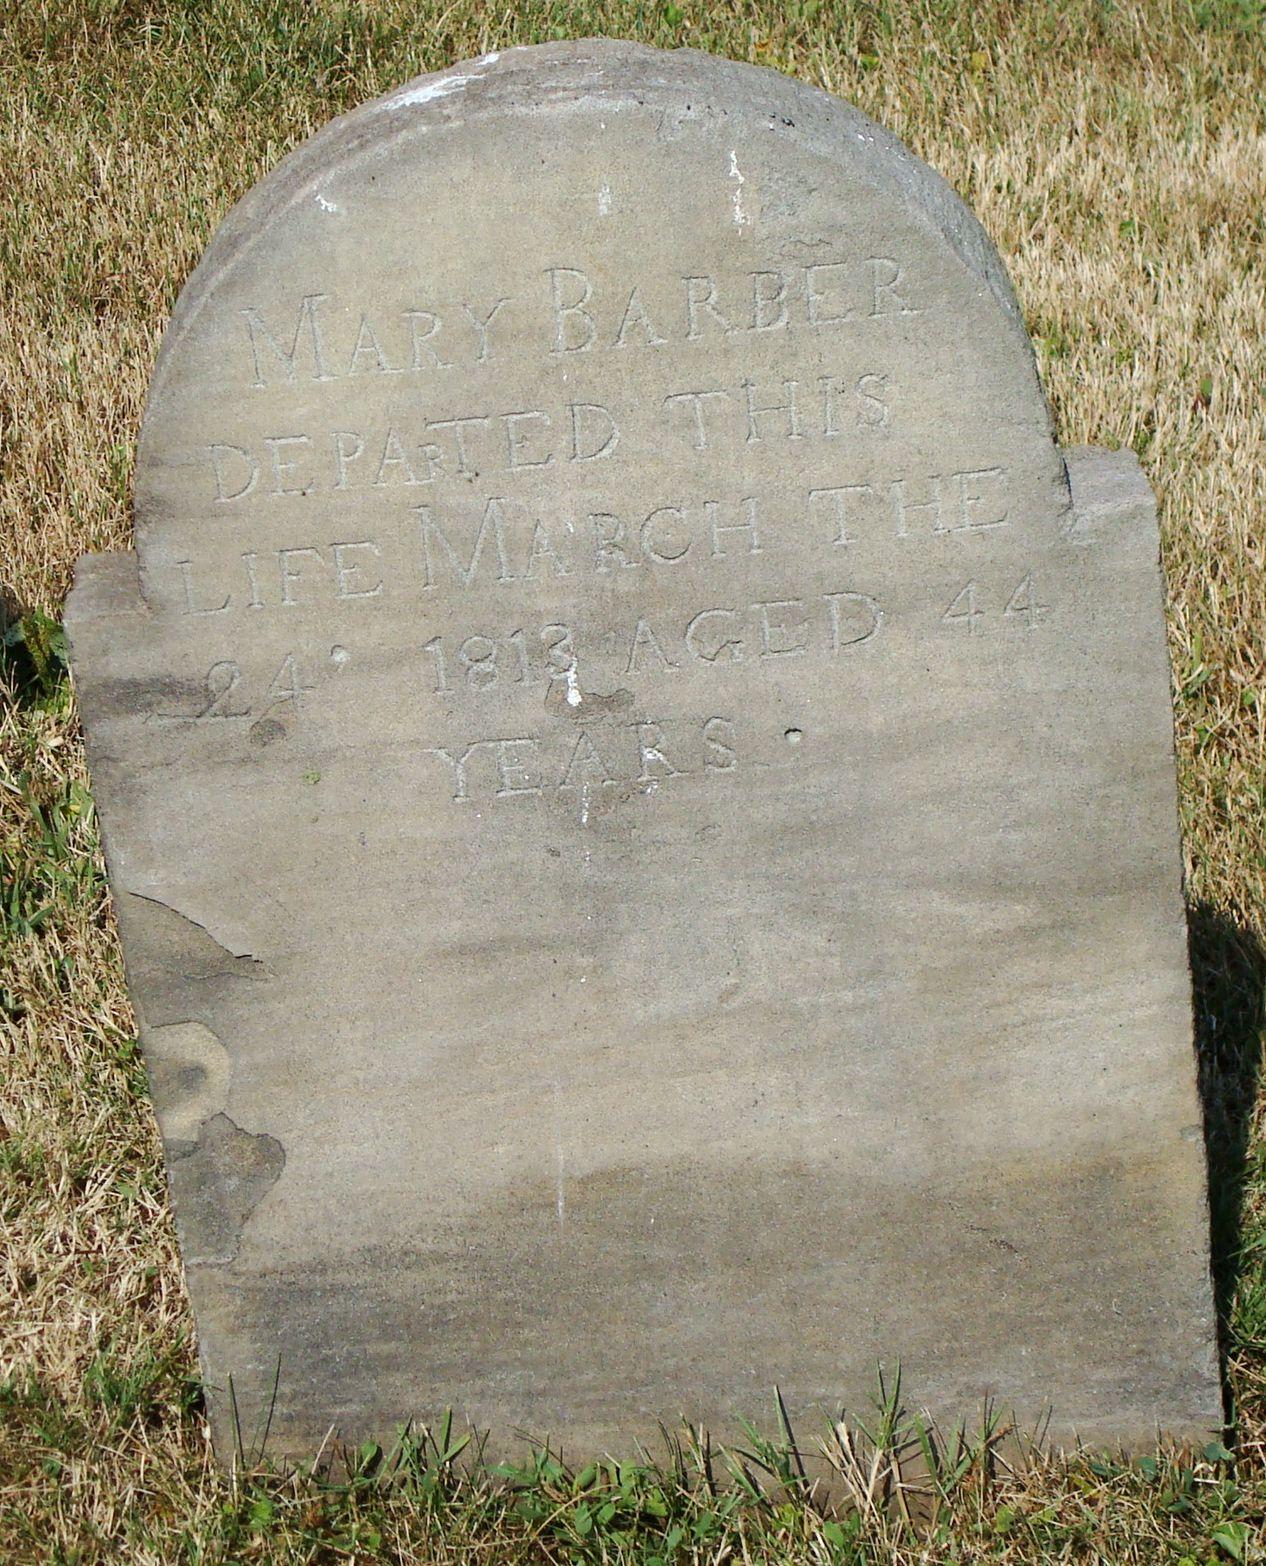 Mary Barber stone South Plain Grove Cemetery